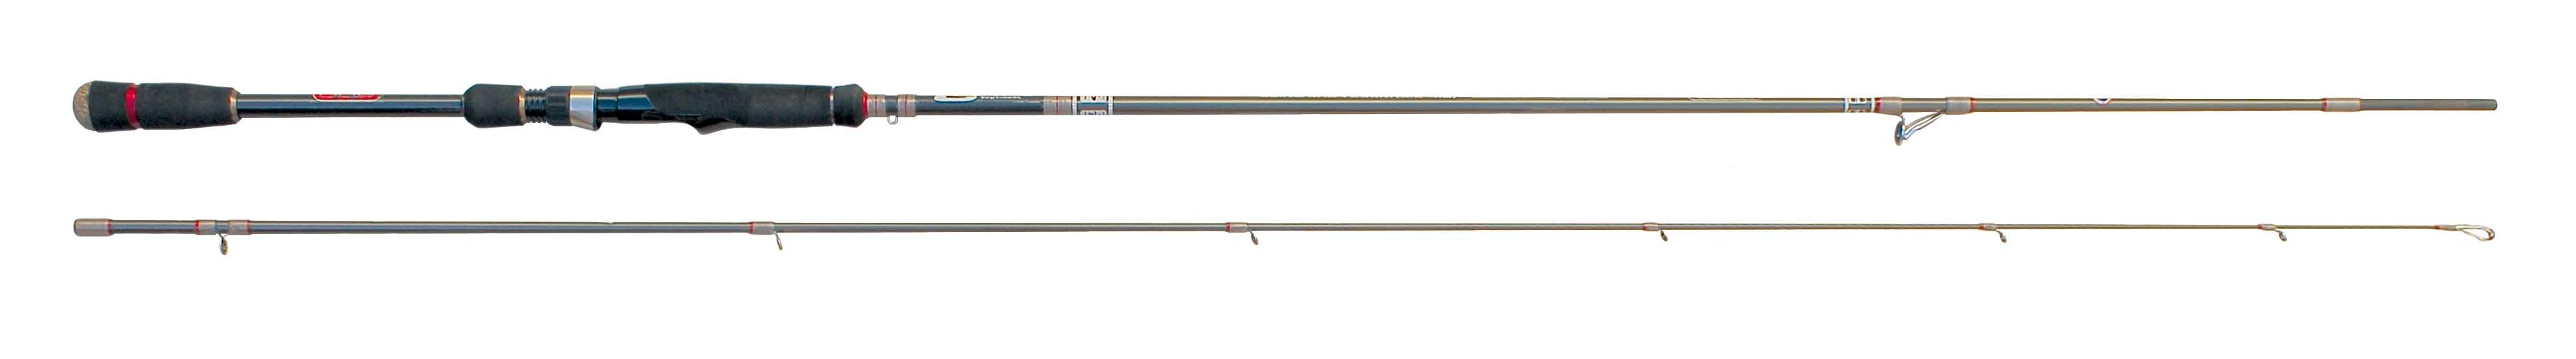 egicrb2.5-4m